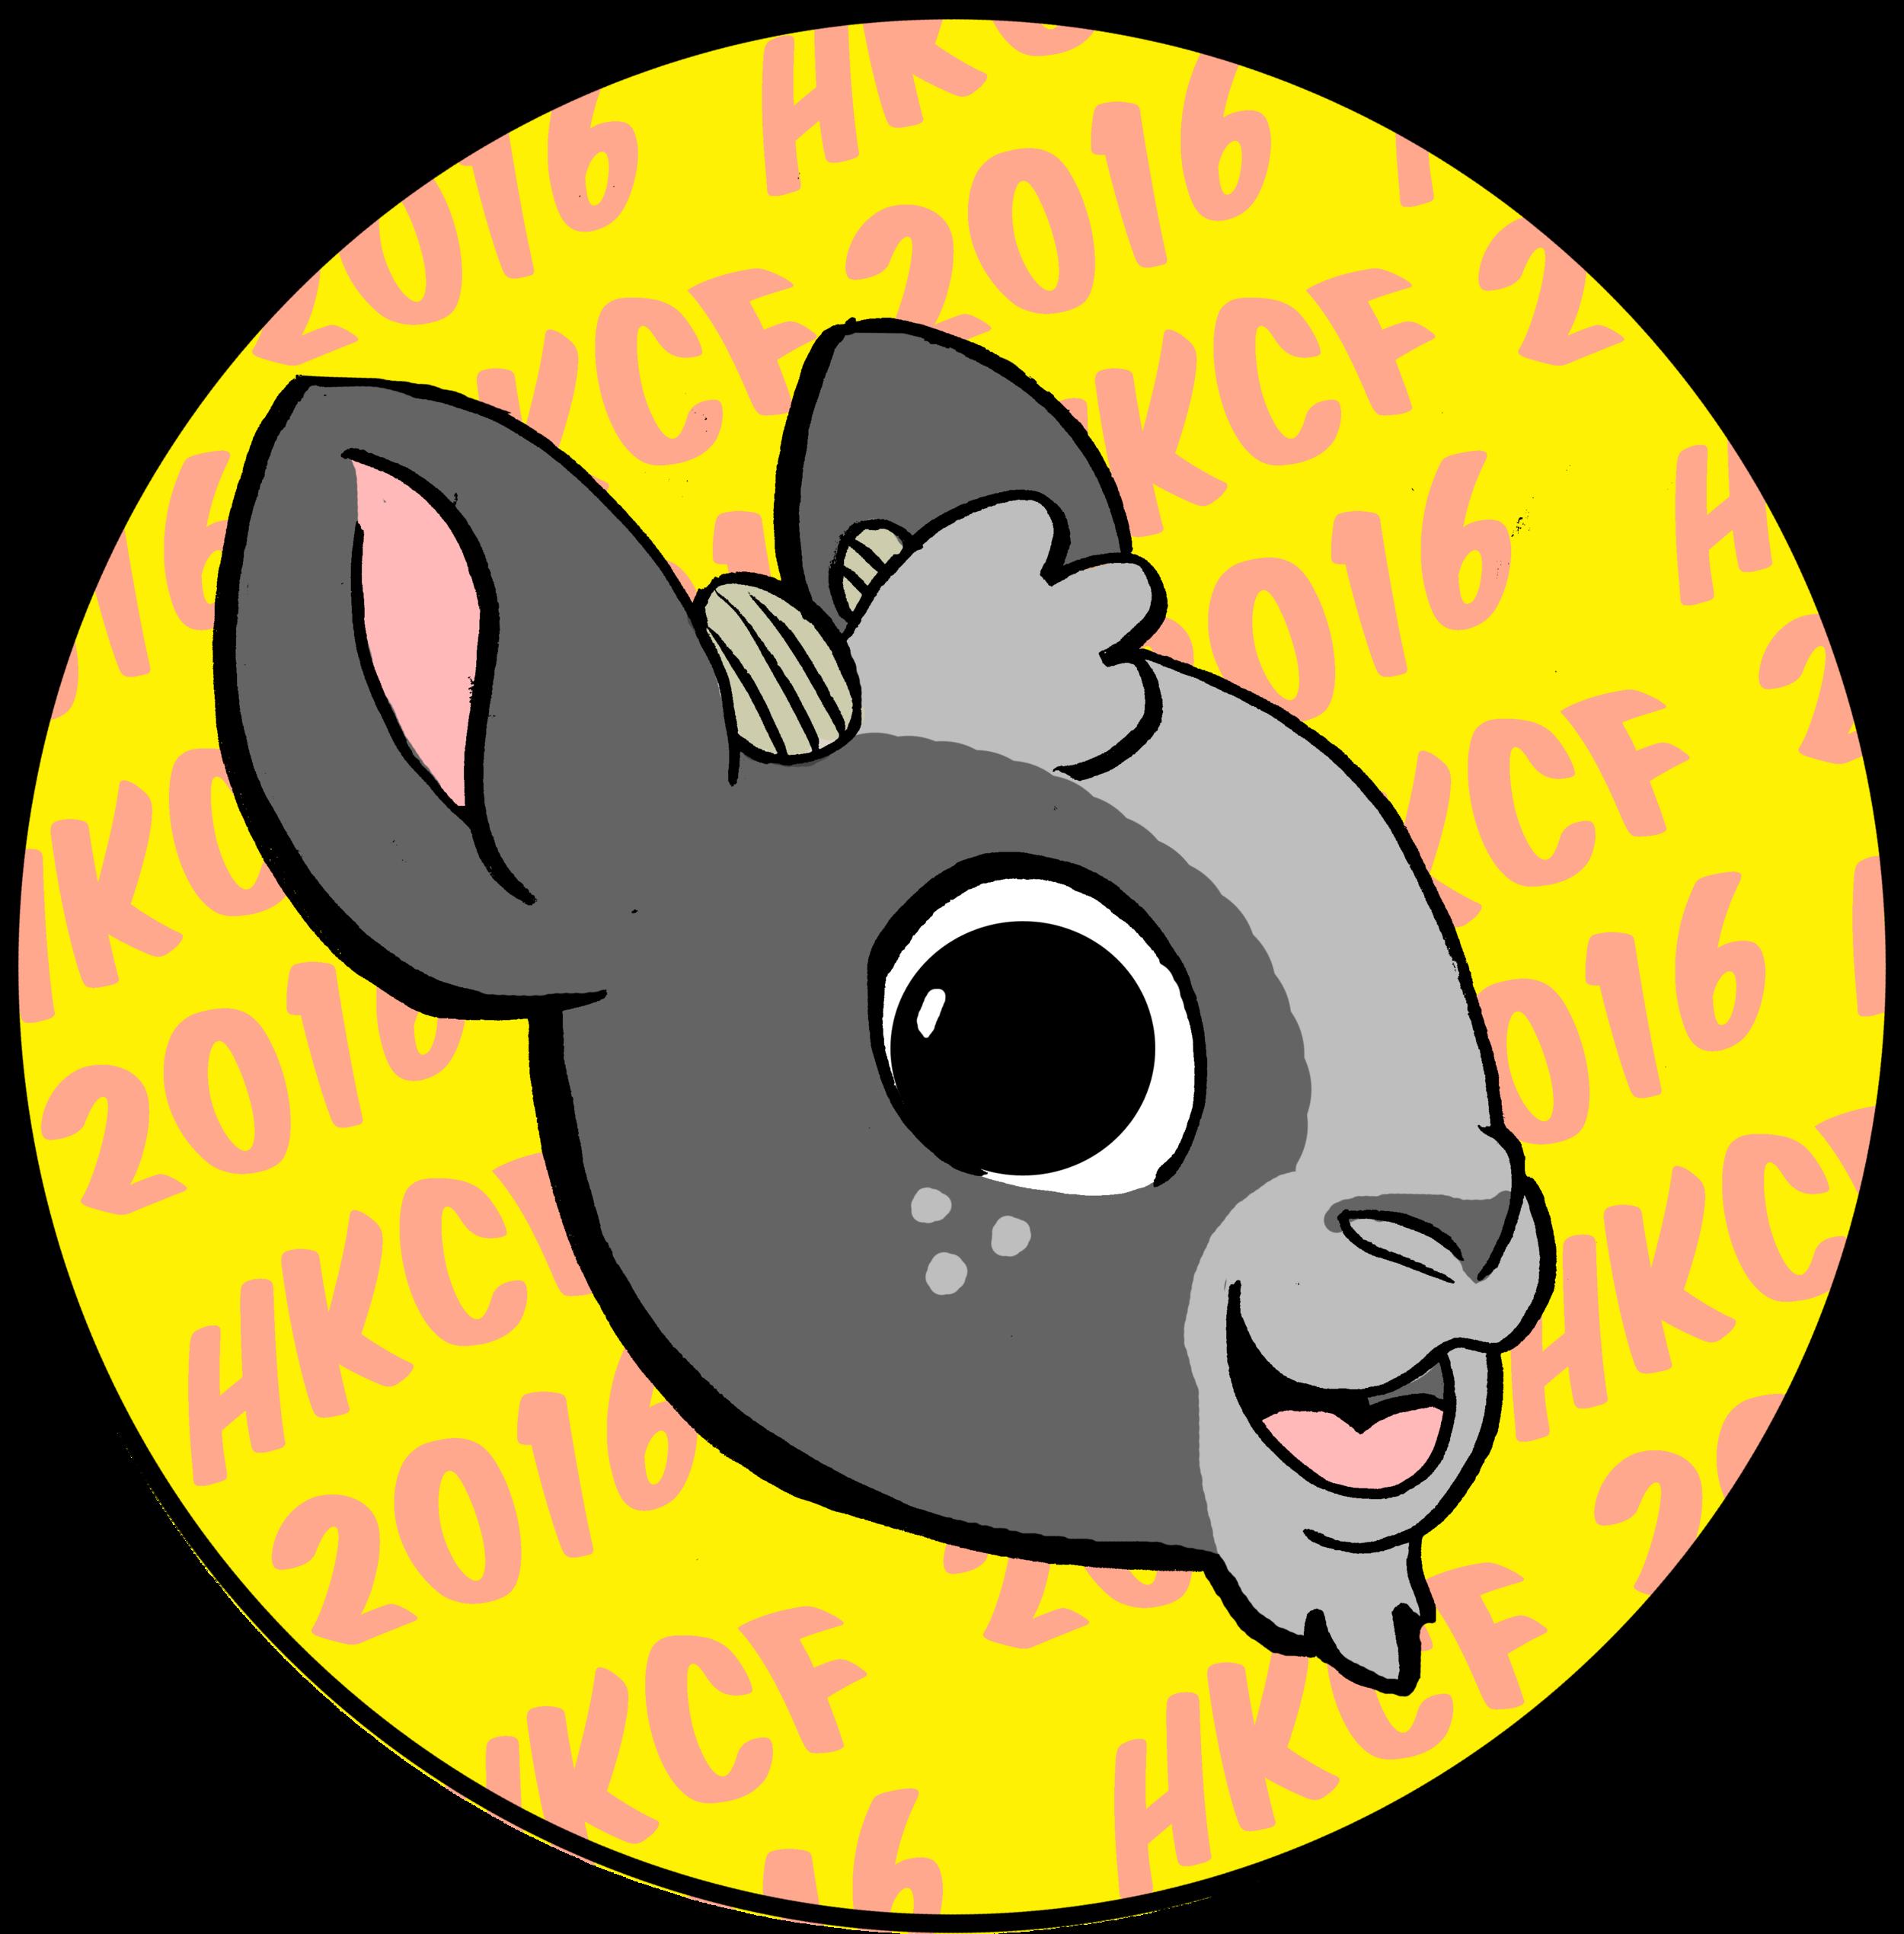 HKCF Sticker.png